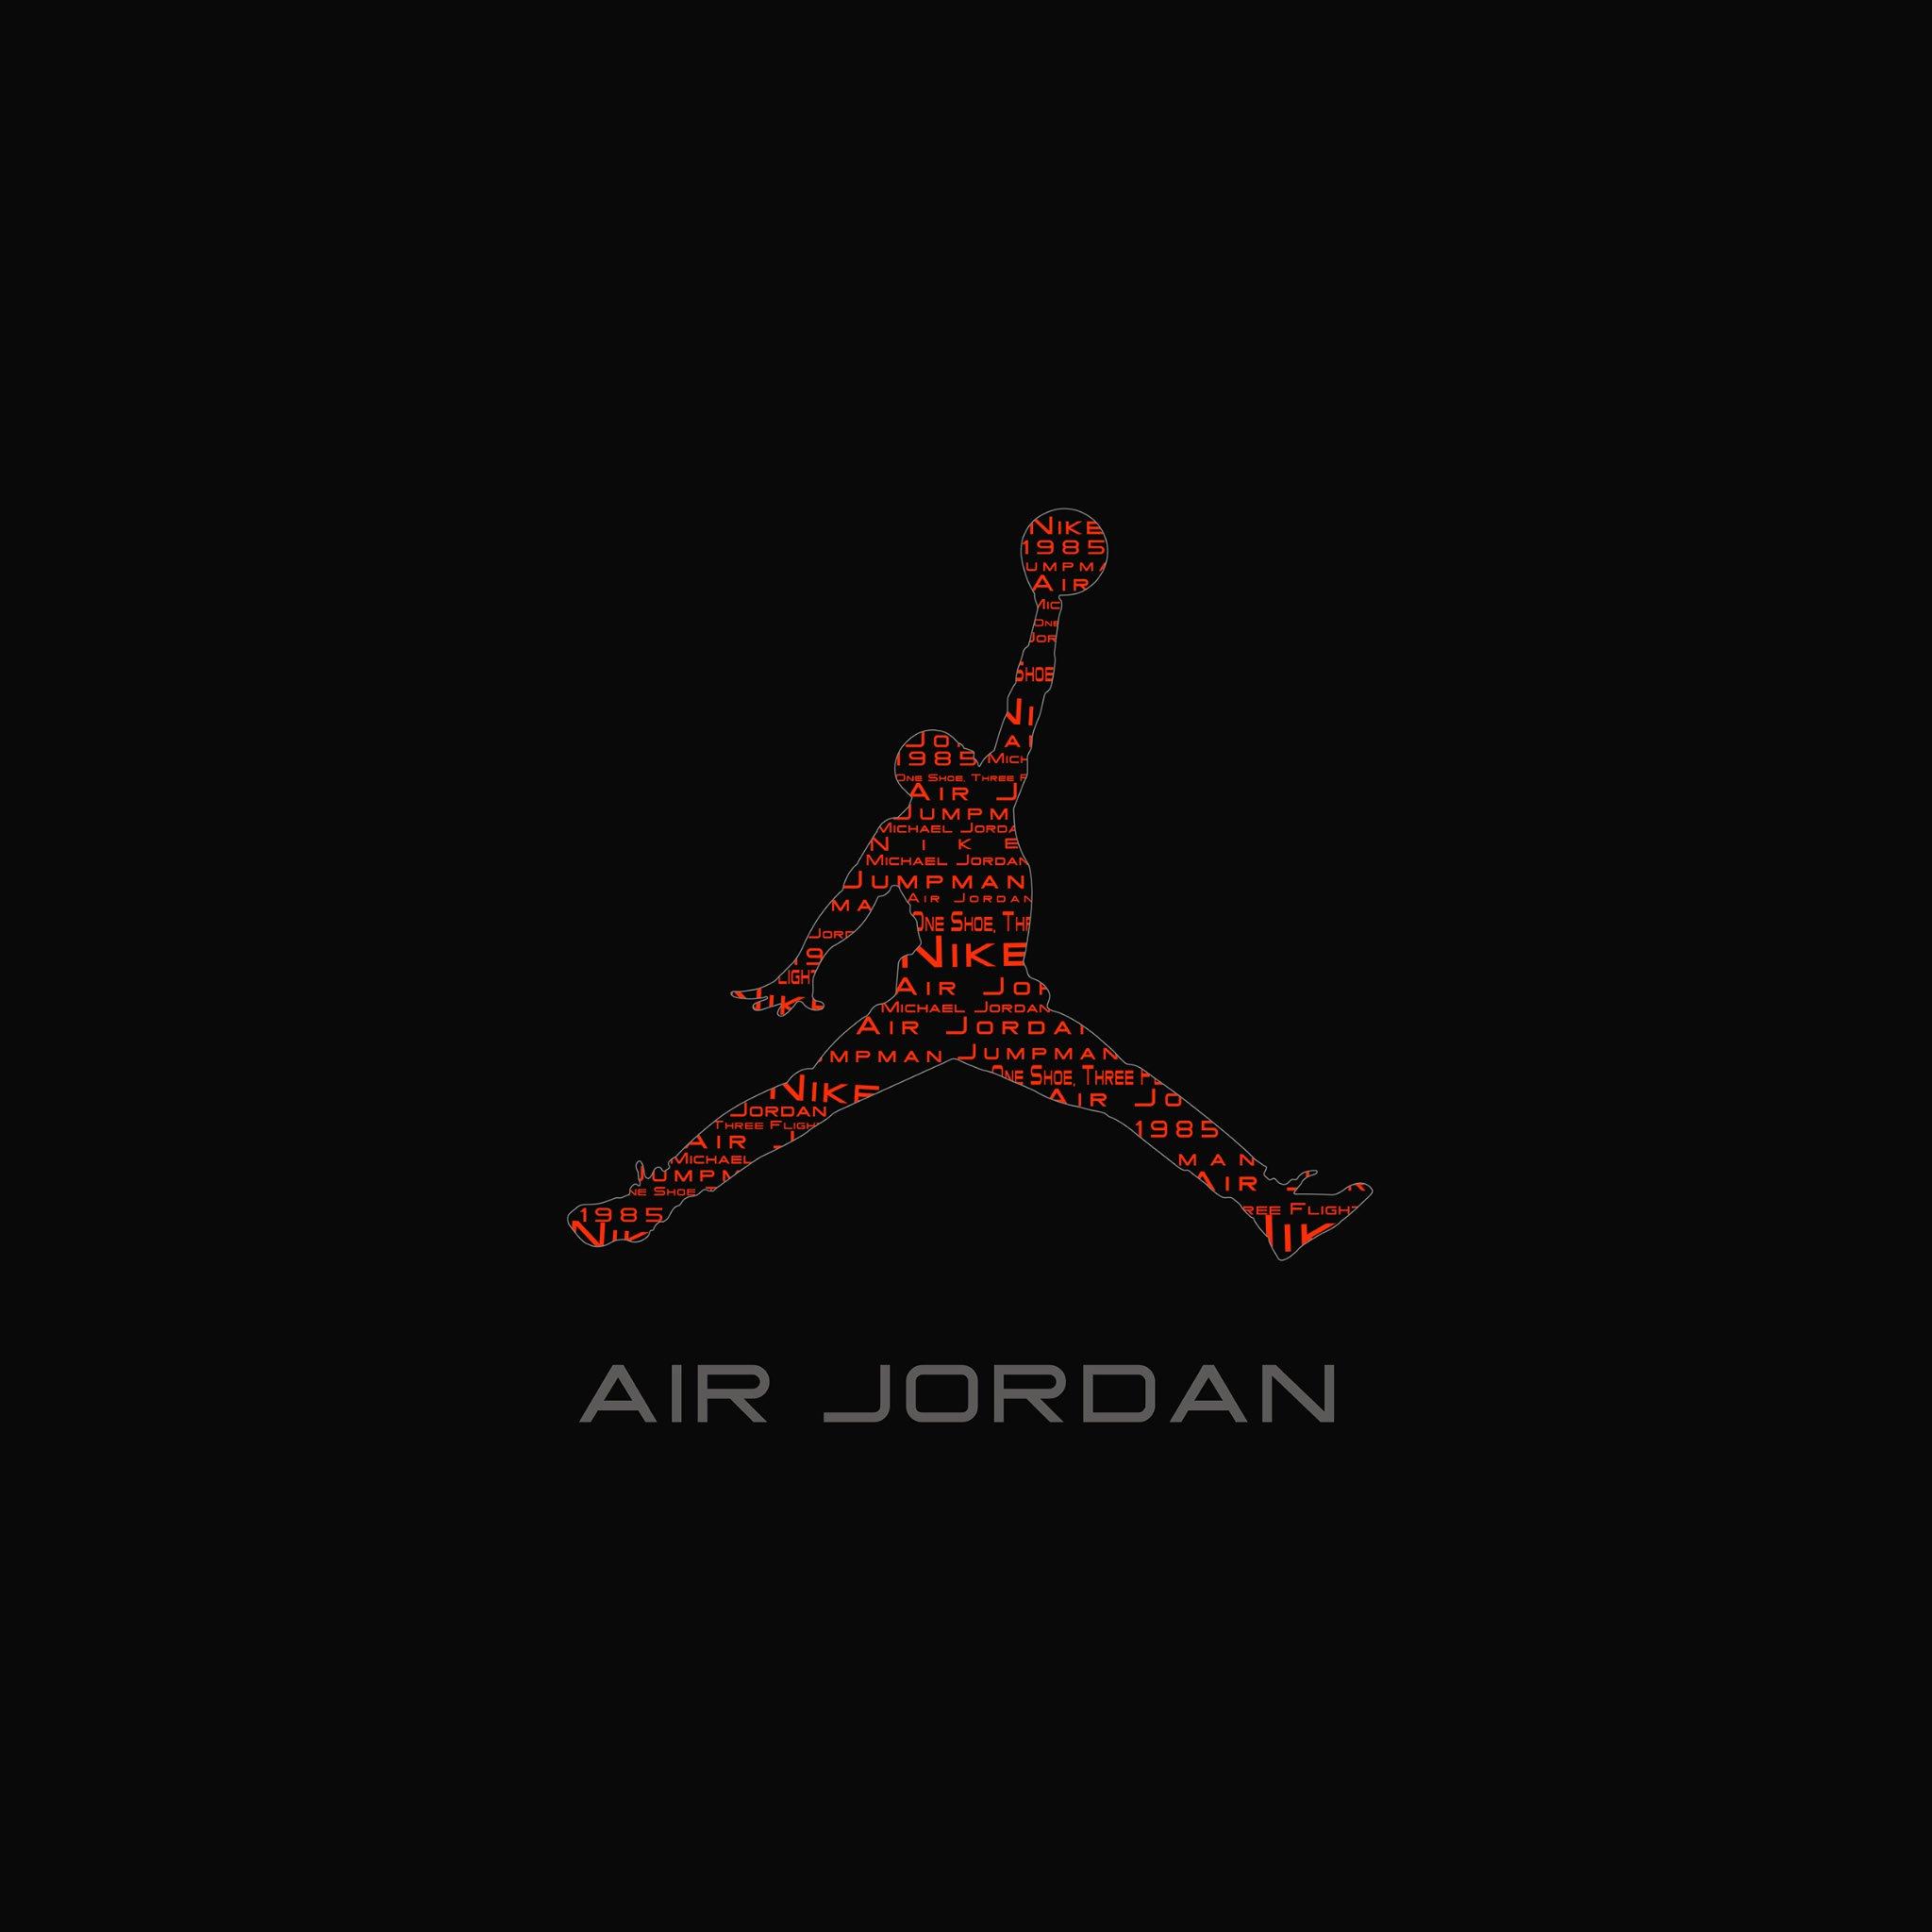 Iphone Wallpaper Jordan Green Poison 2048x2048